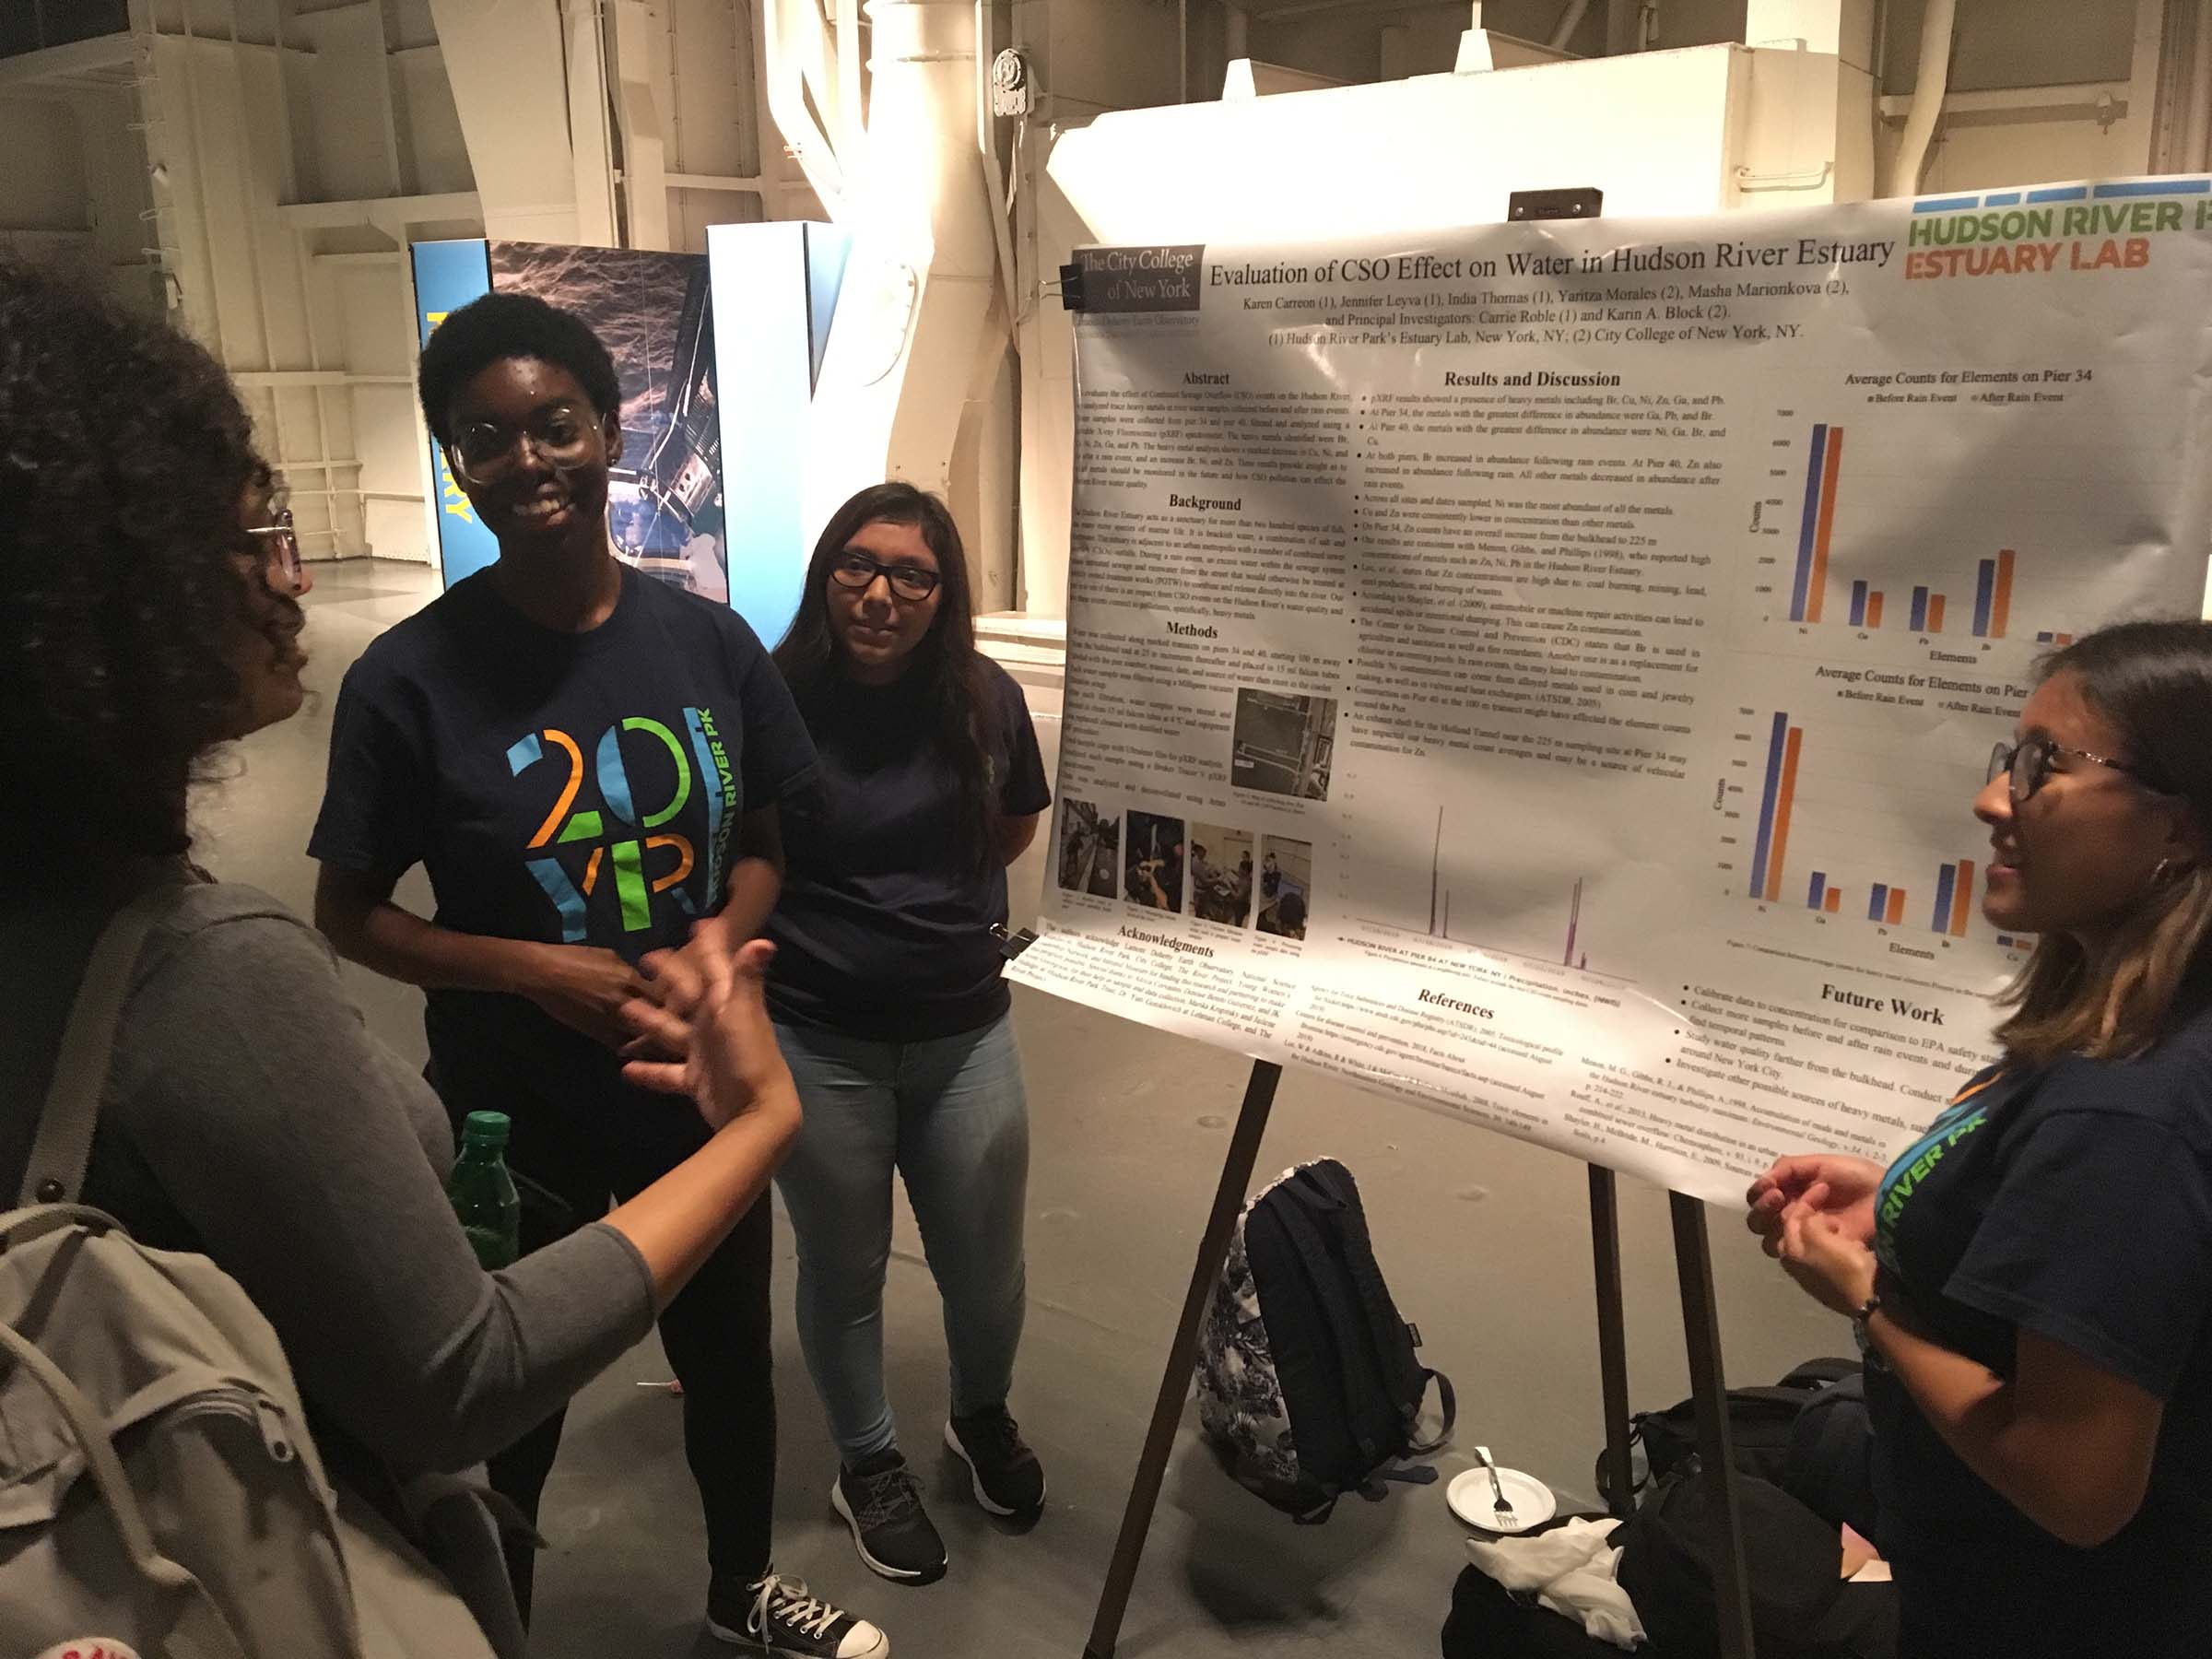 Interns help present findings